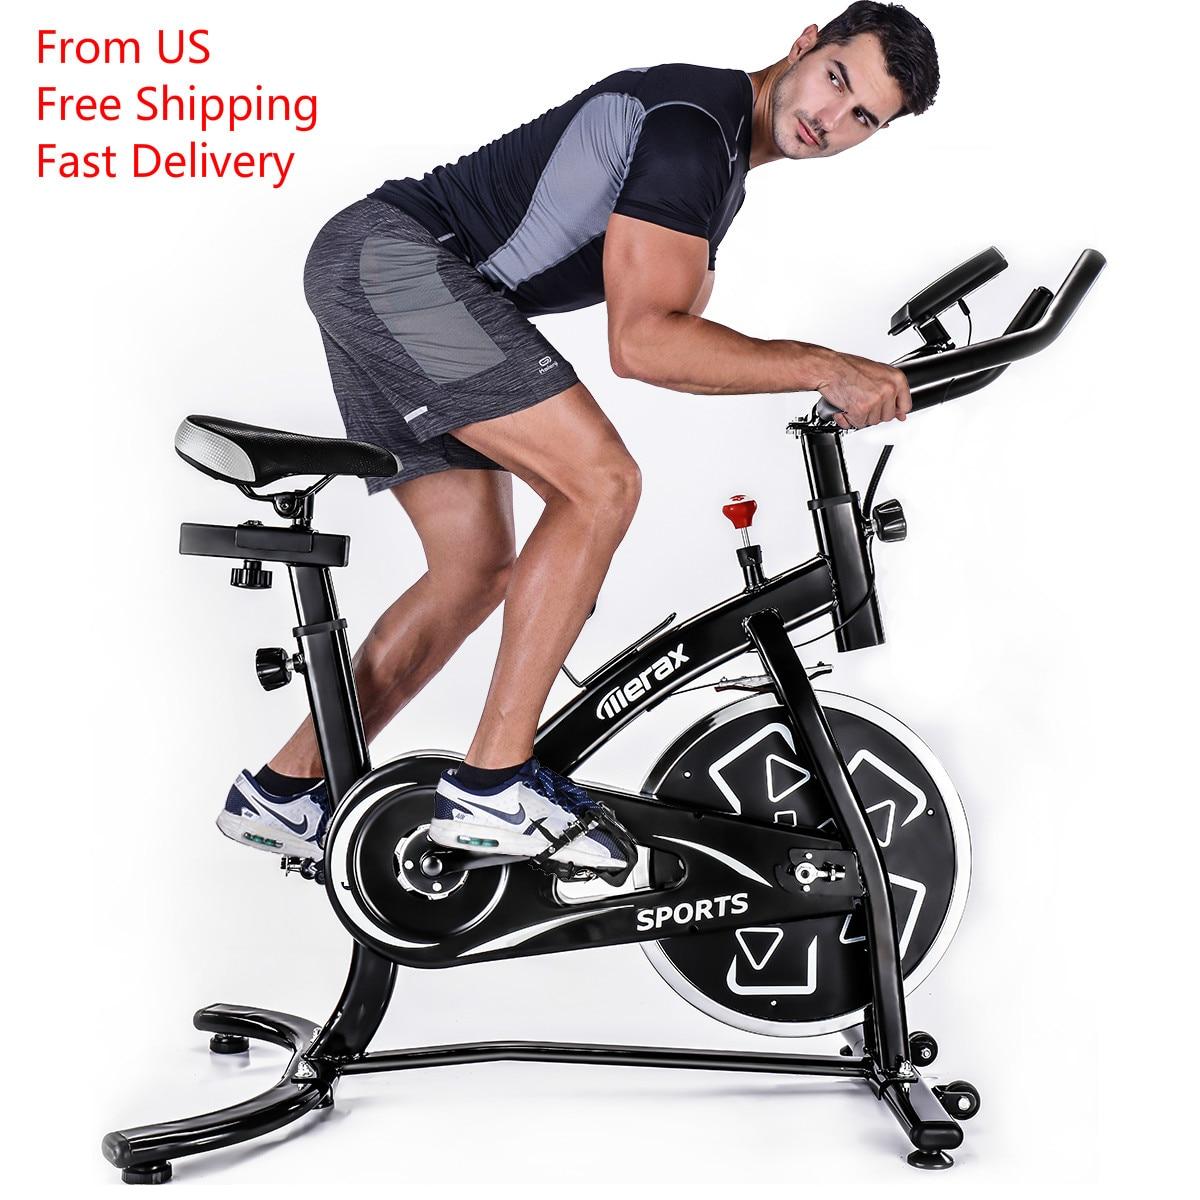 TREXM S280 Professional Indoor Cycling Bike Belt Drive Exercise Bike With 22lbs Flywheel Gym Bike Fitness Equipment LED Display